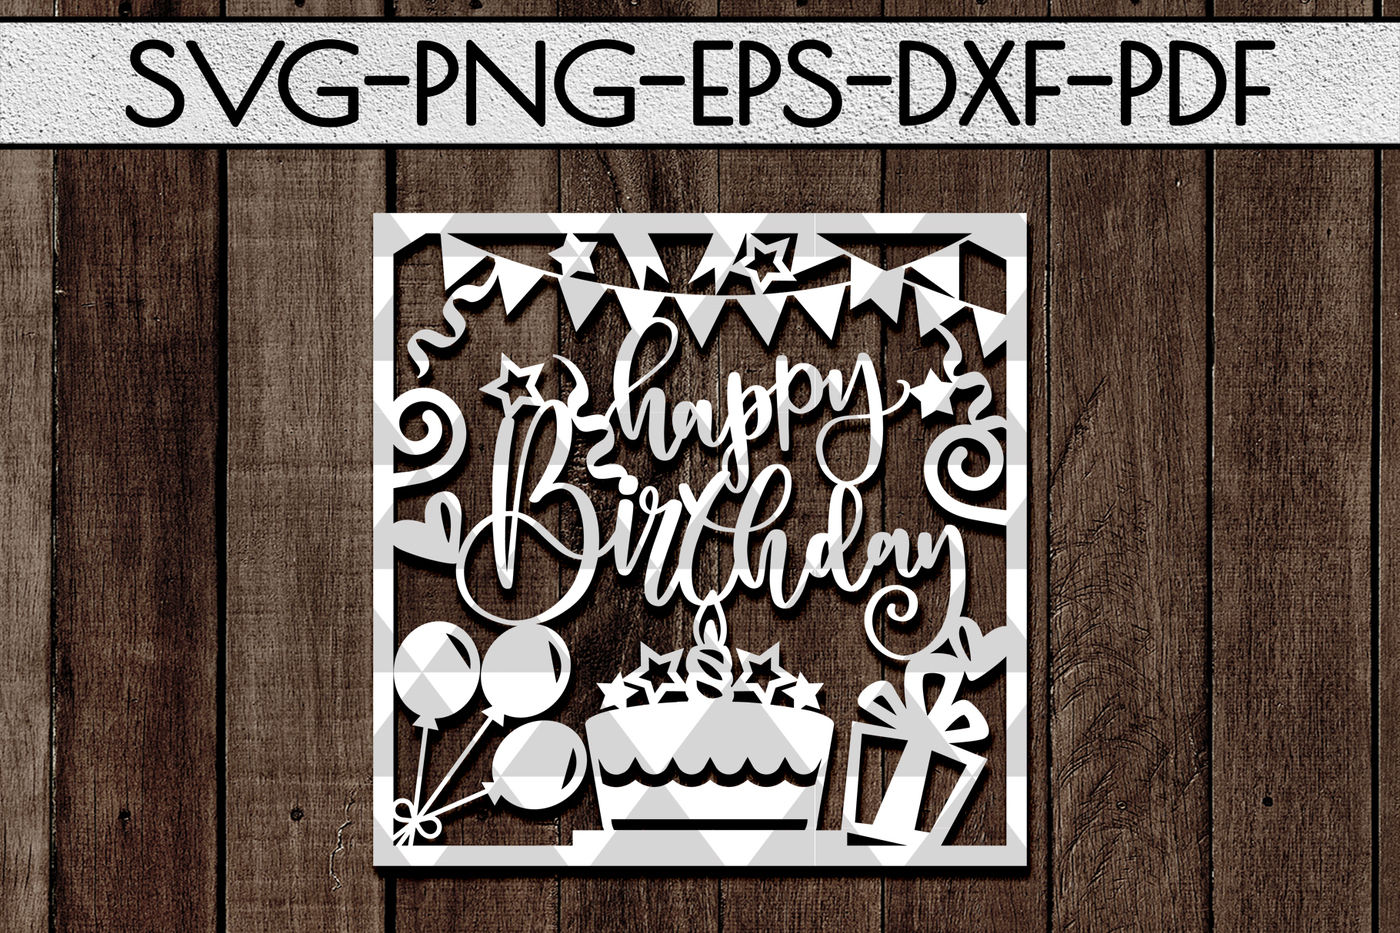 Happy Birthday Svg Cutting File Birthday Card Papercut Dxf Pdf By Mulia Designs Thehungryjpeg Com